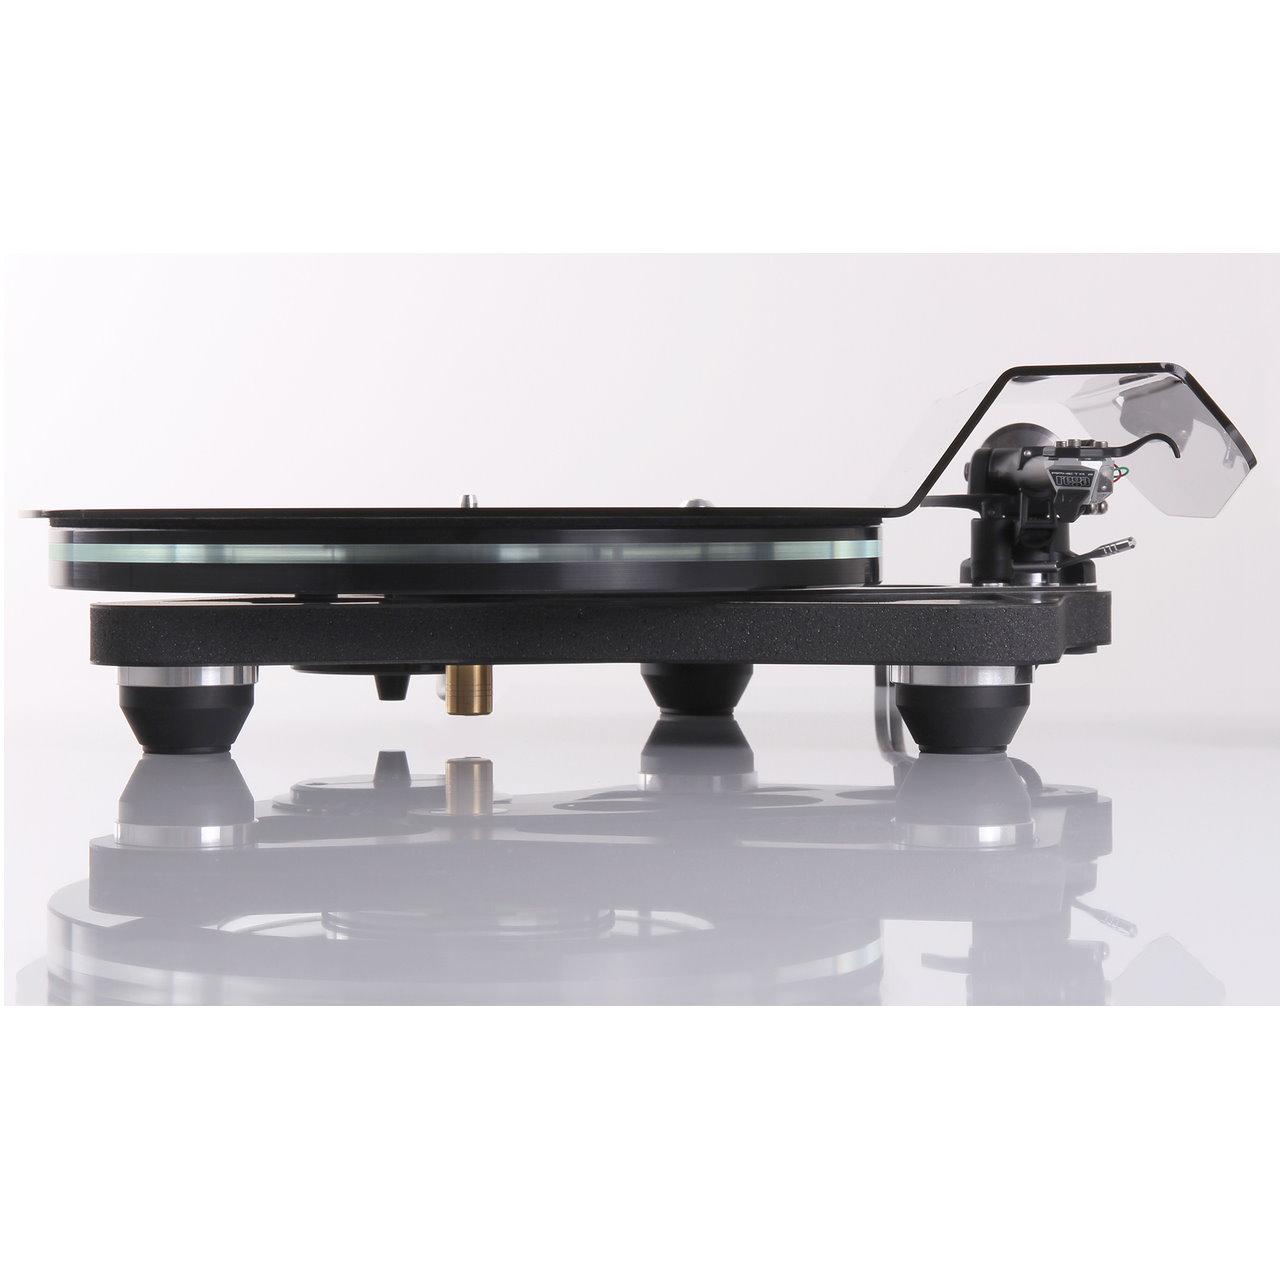 Rega Planar 8 Turntable with Neo PSU